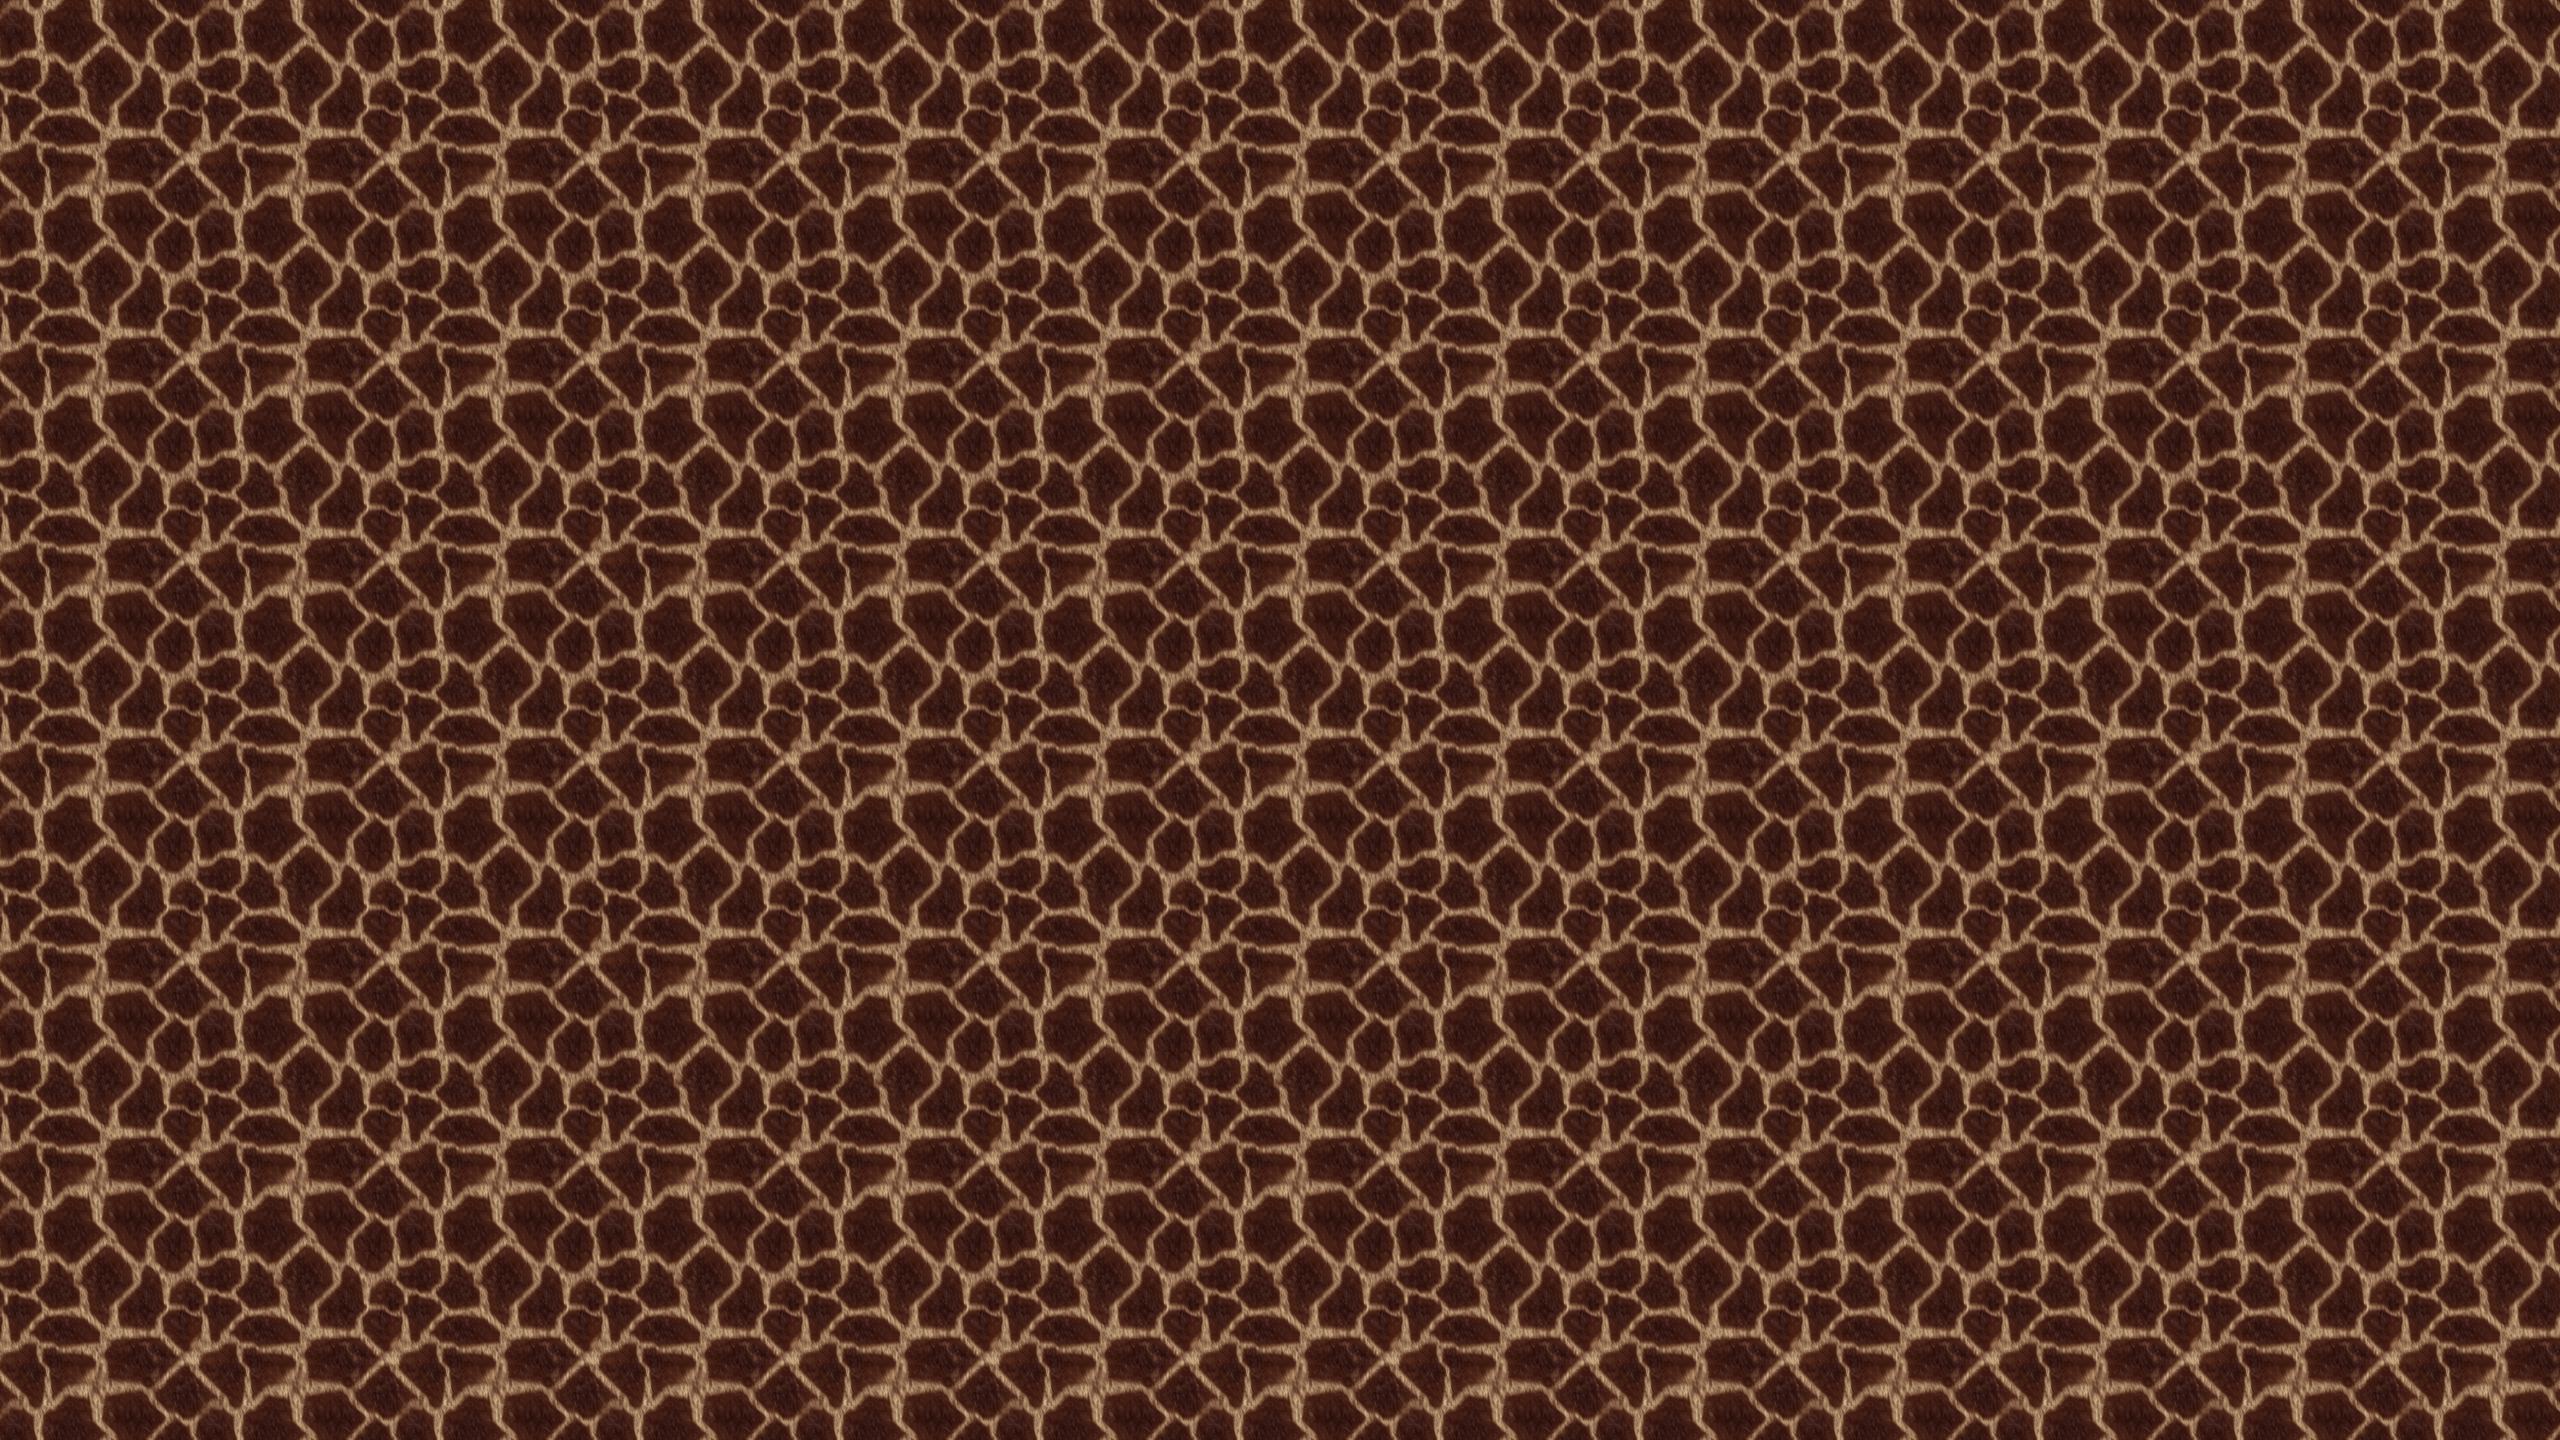 Animal Print Desktop Wallpaper is easy Just save the wallpaper 2560x1440